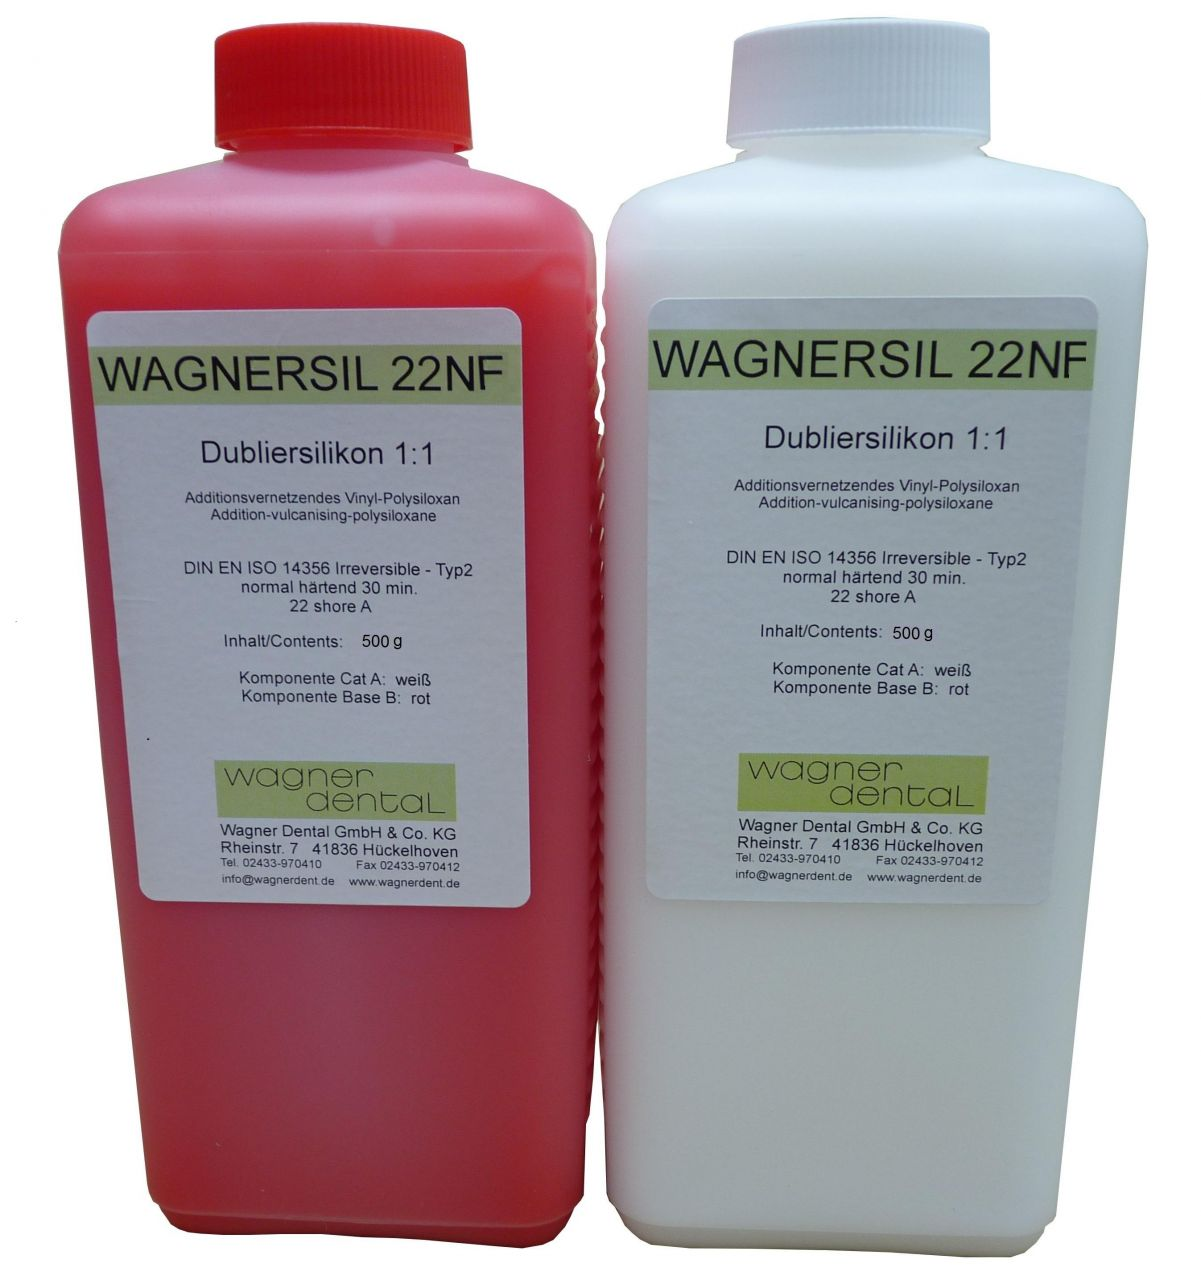 Wagnersil Premium 22 NF rosa Shore 22 EFZ 30 min 1:1